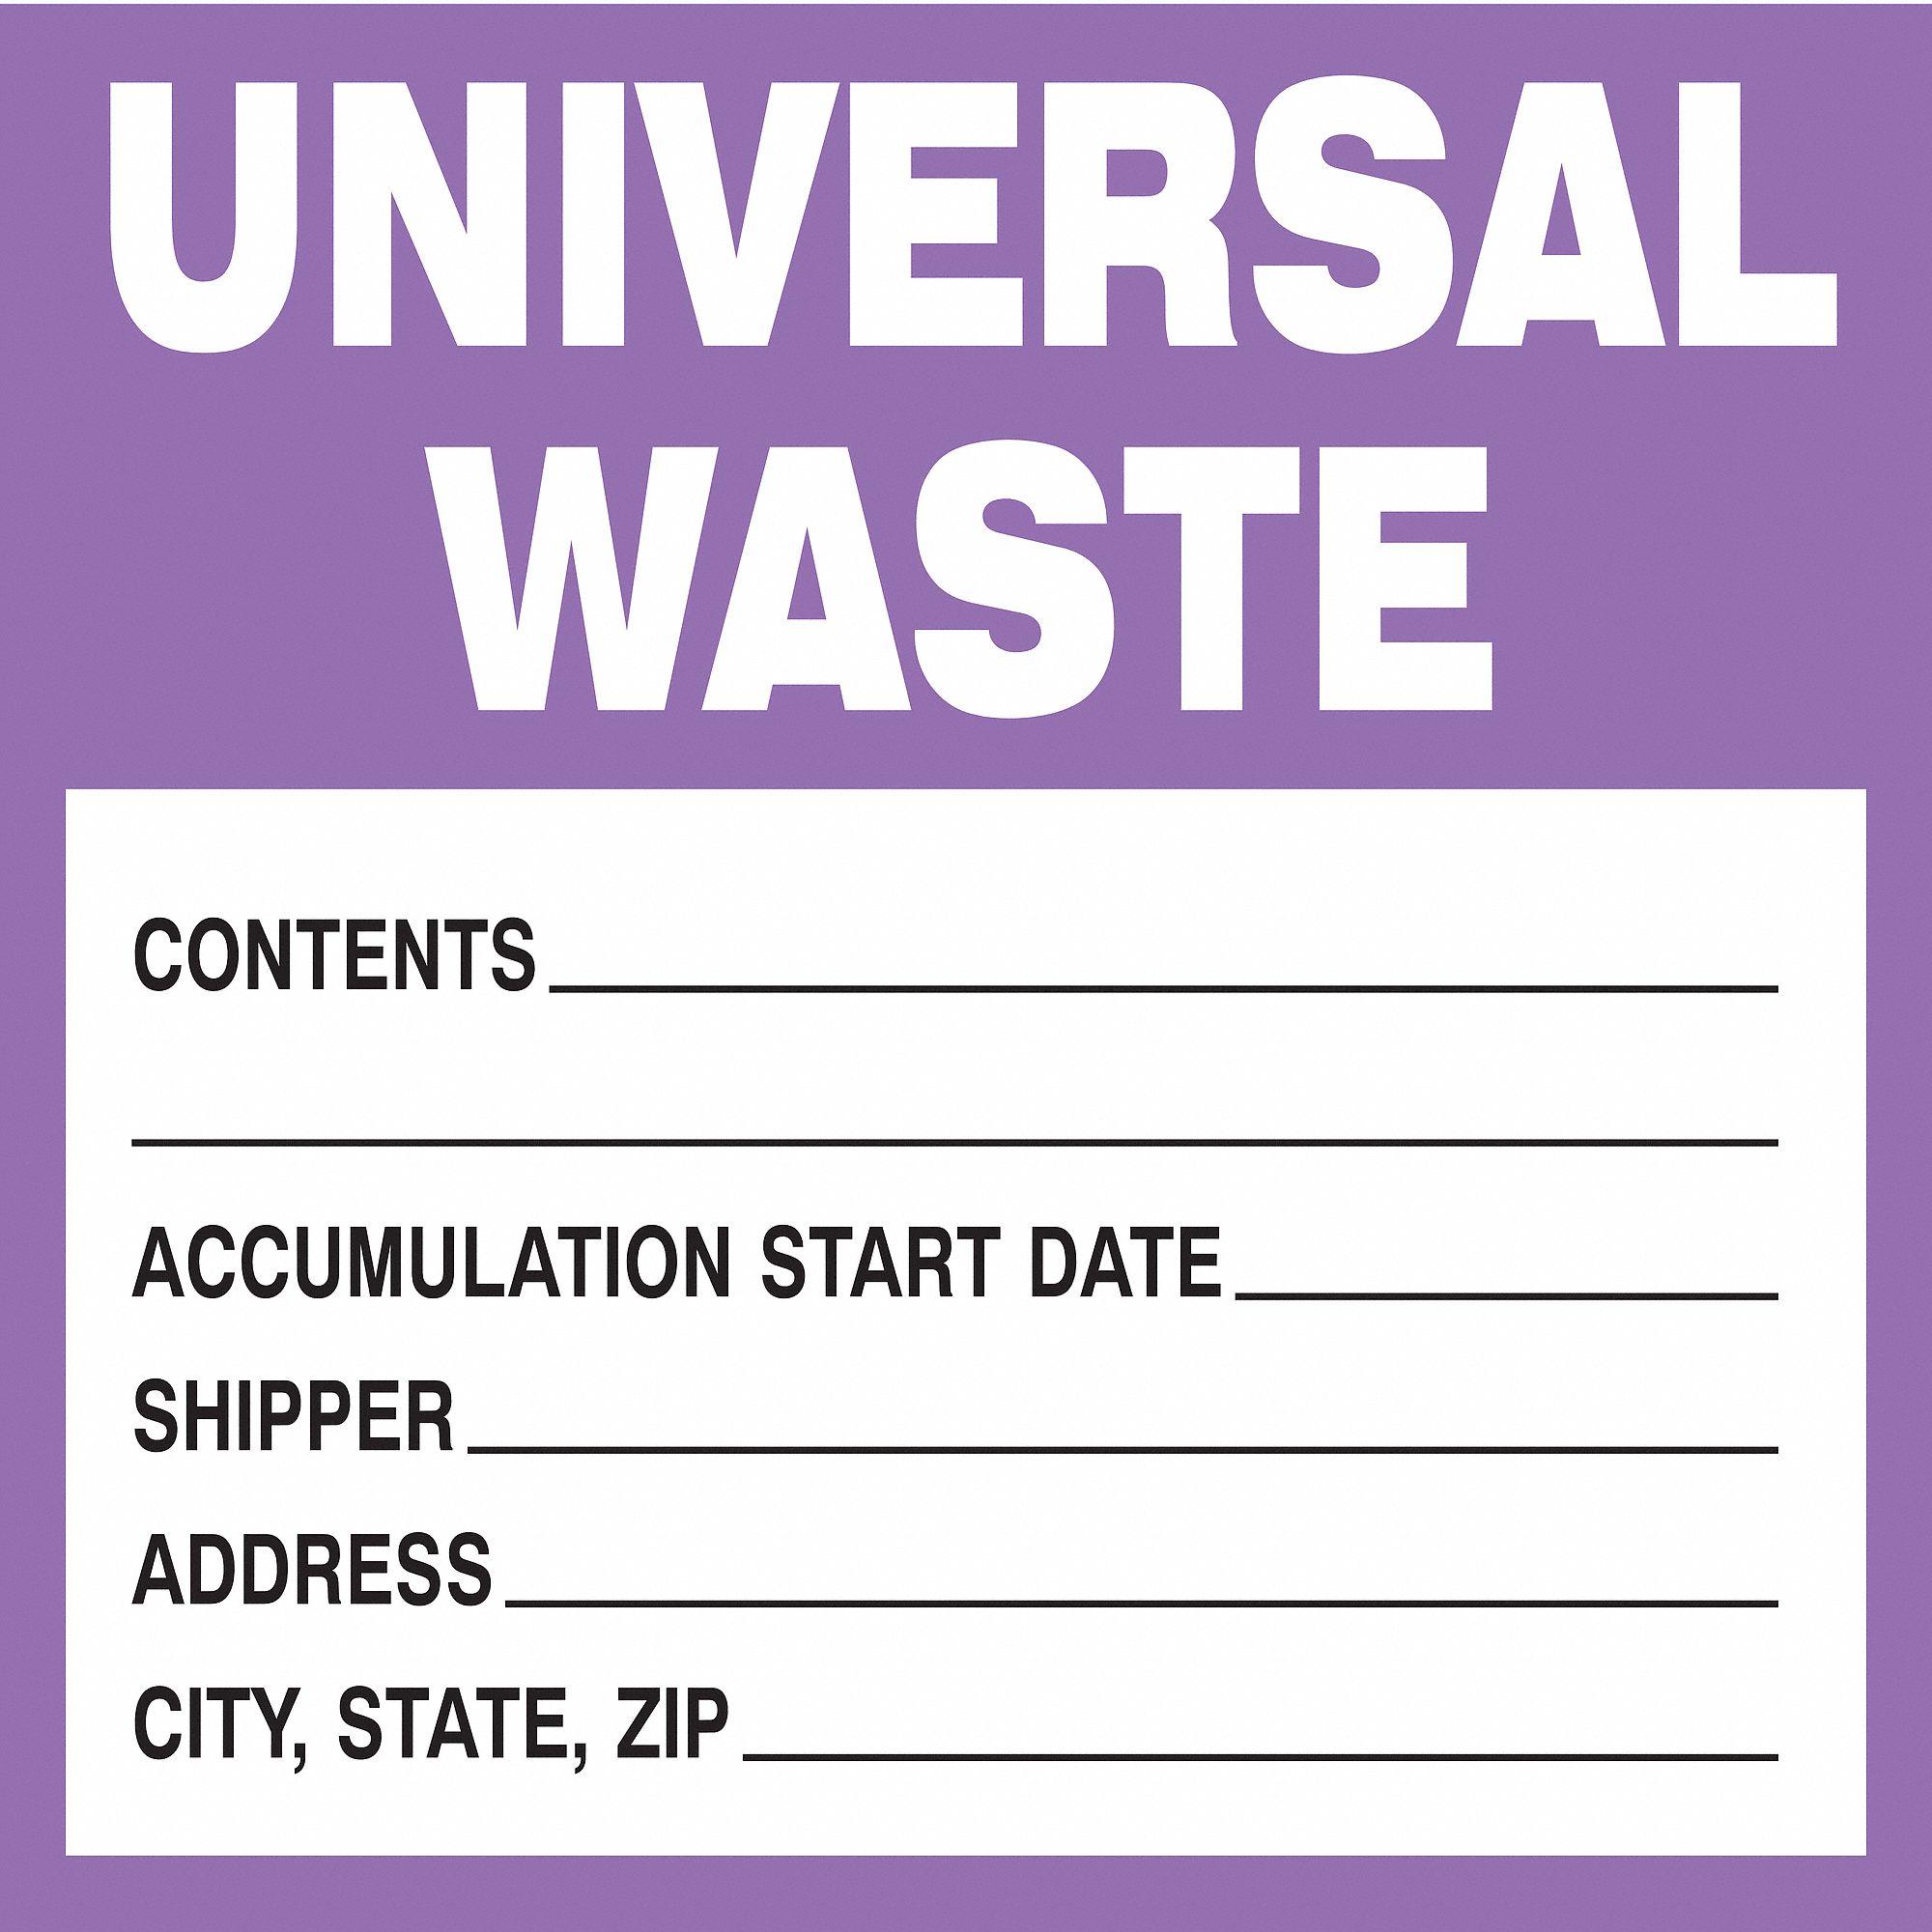 brady label templates - brady paper waste label 6 height 6 width 15y490